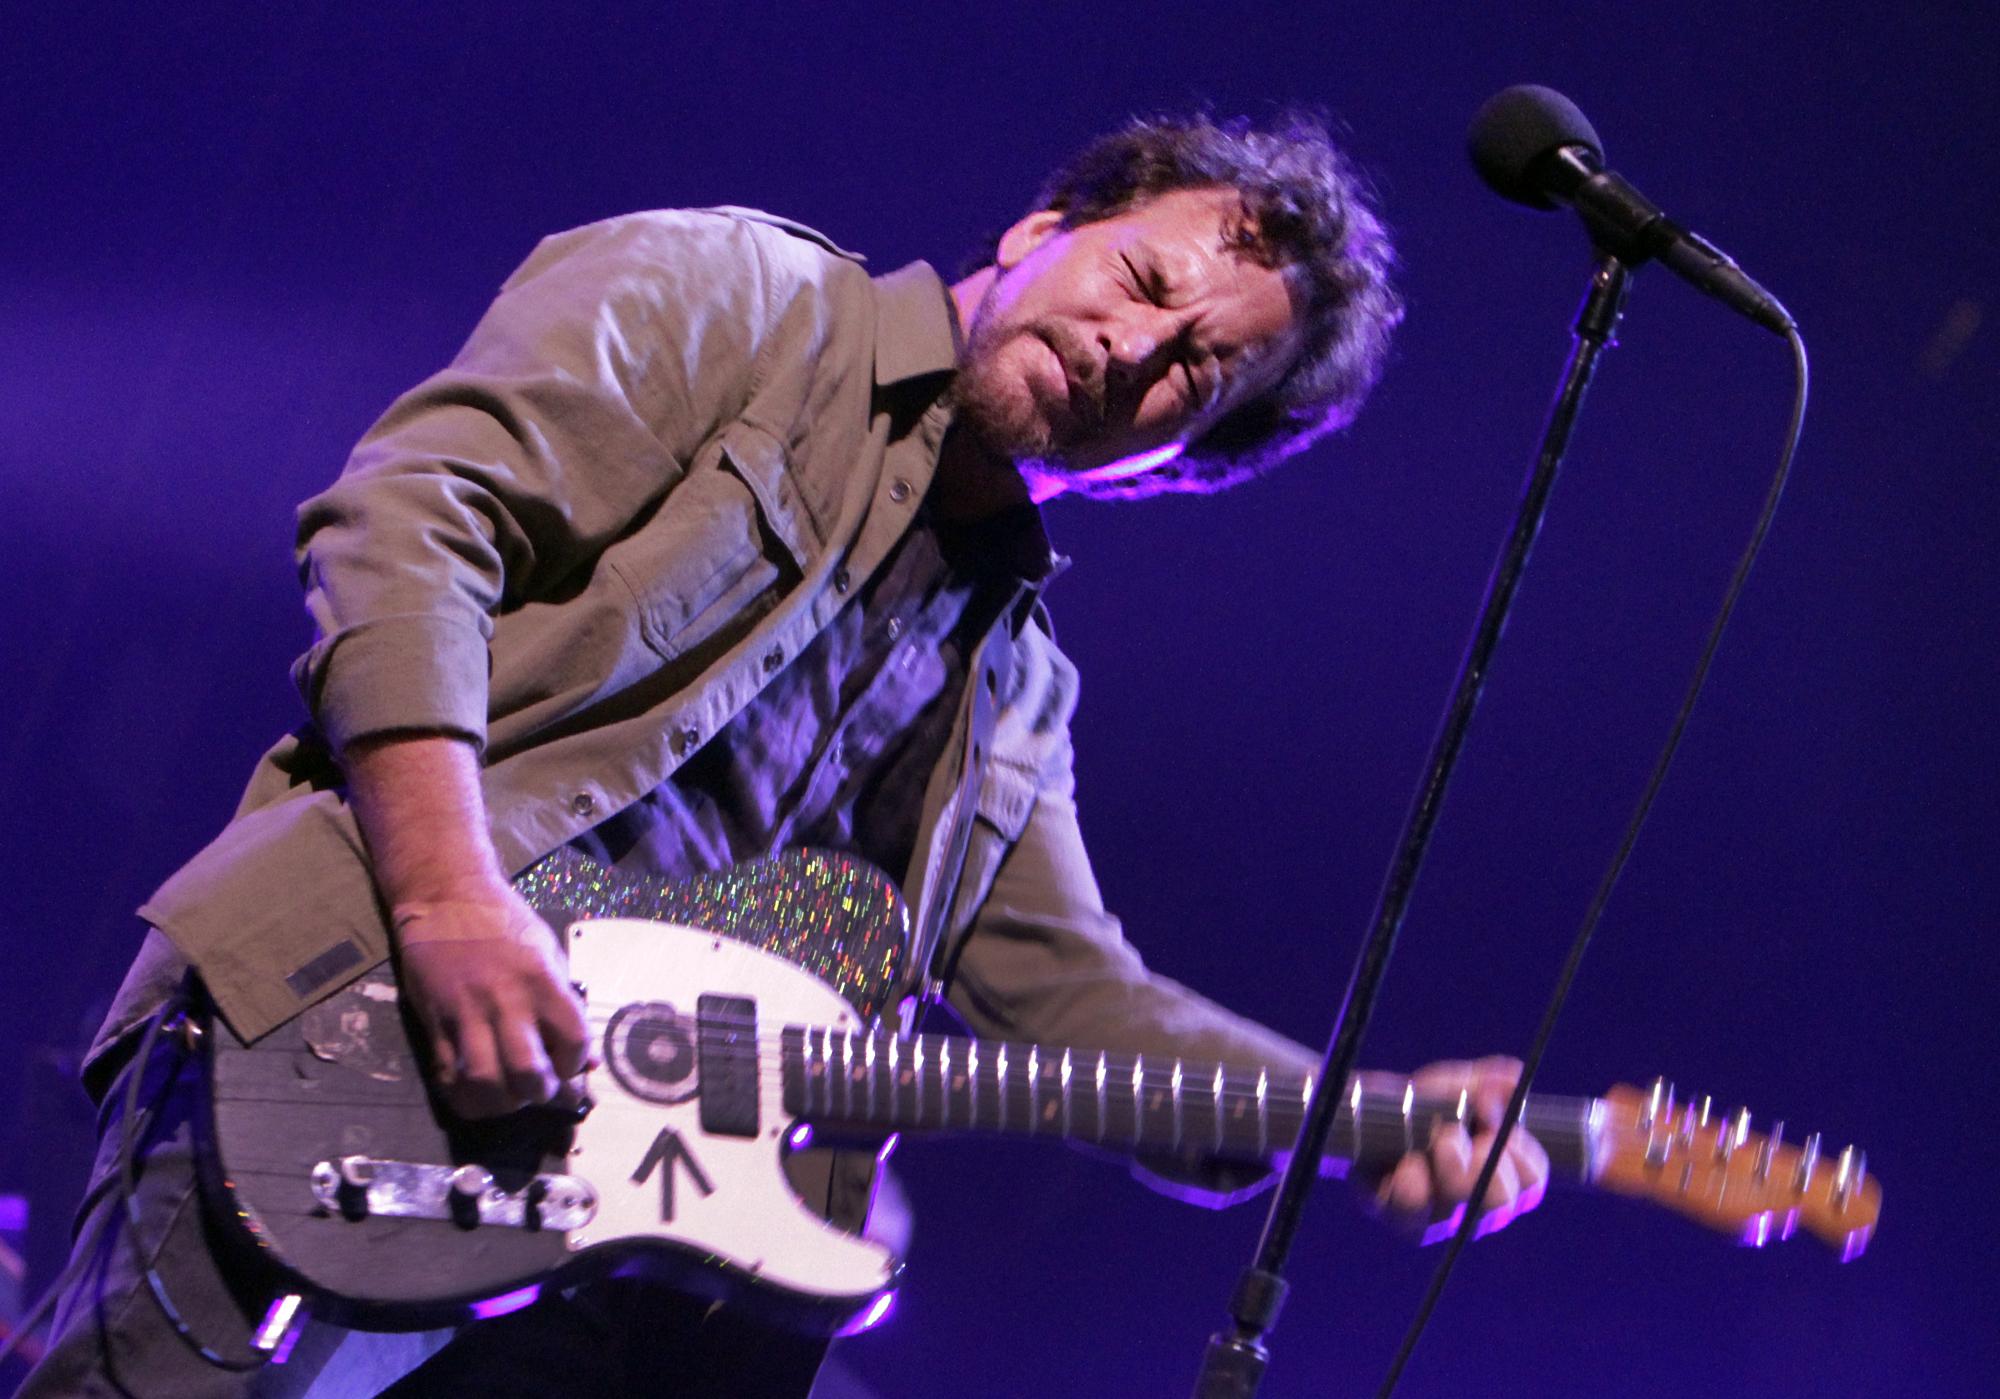 Eddie Vedder of Pearl Jam performs at the LA Sports Arena on Nov. 23, 2013.  Pearl Jam performs at